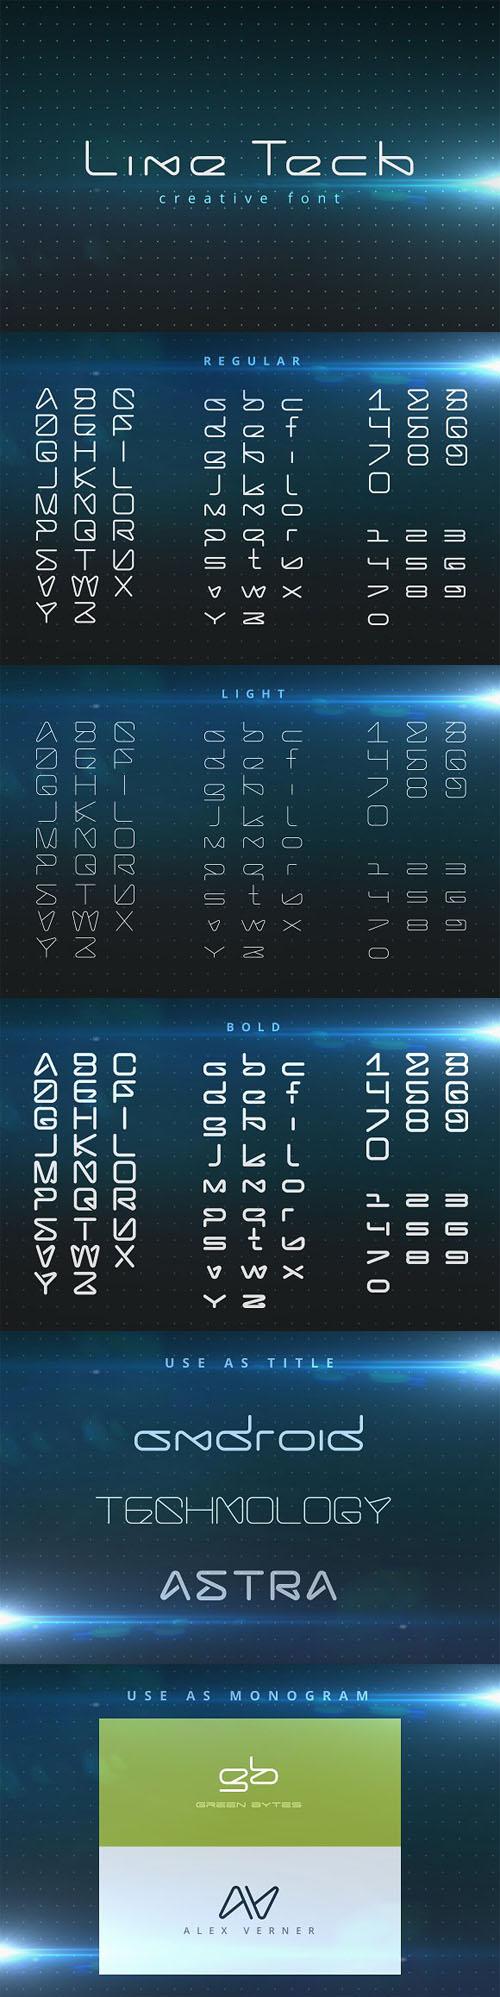 LineTech futuristic technology font 841052